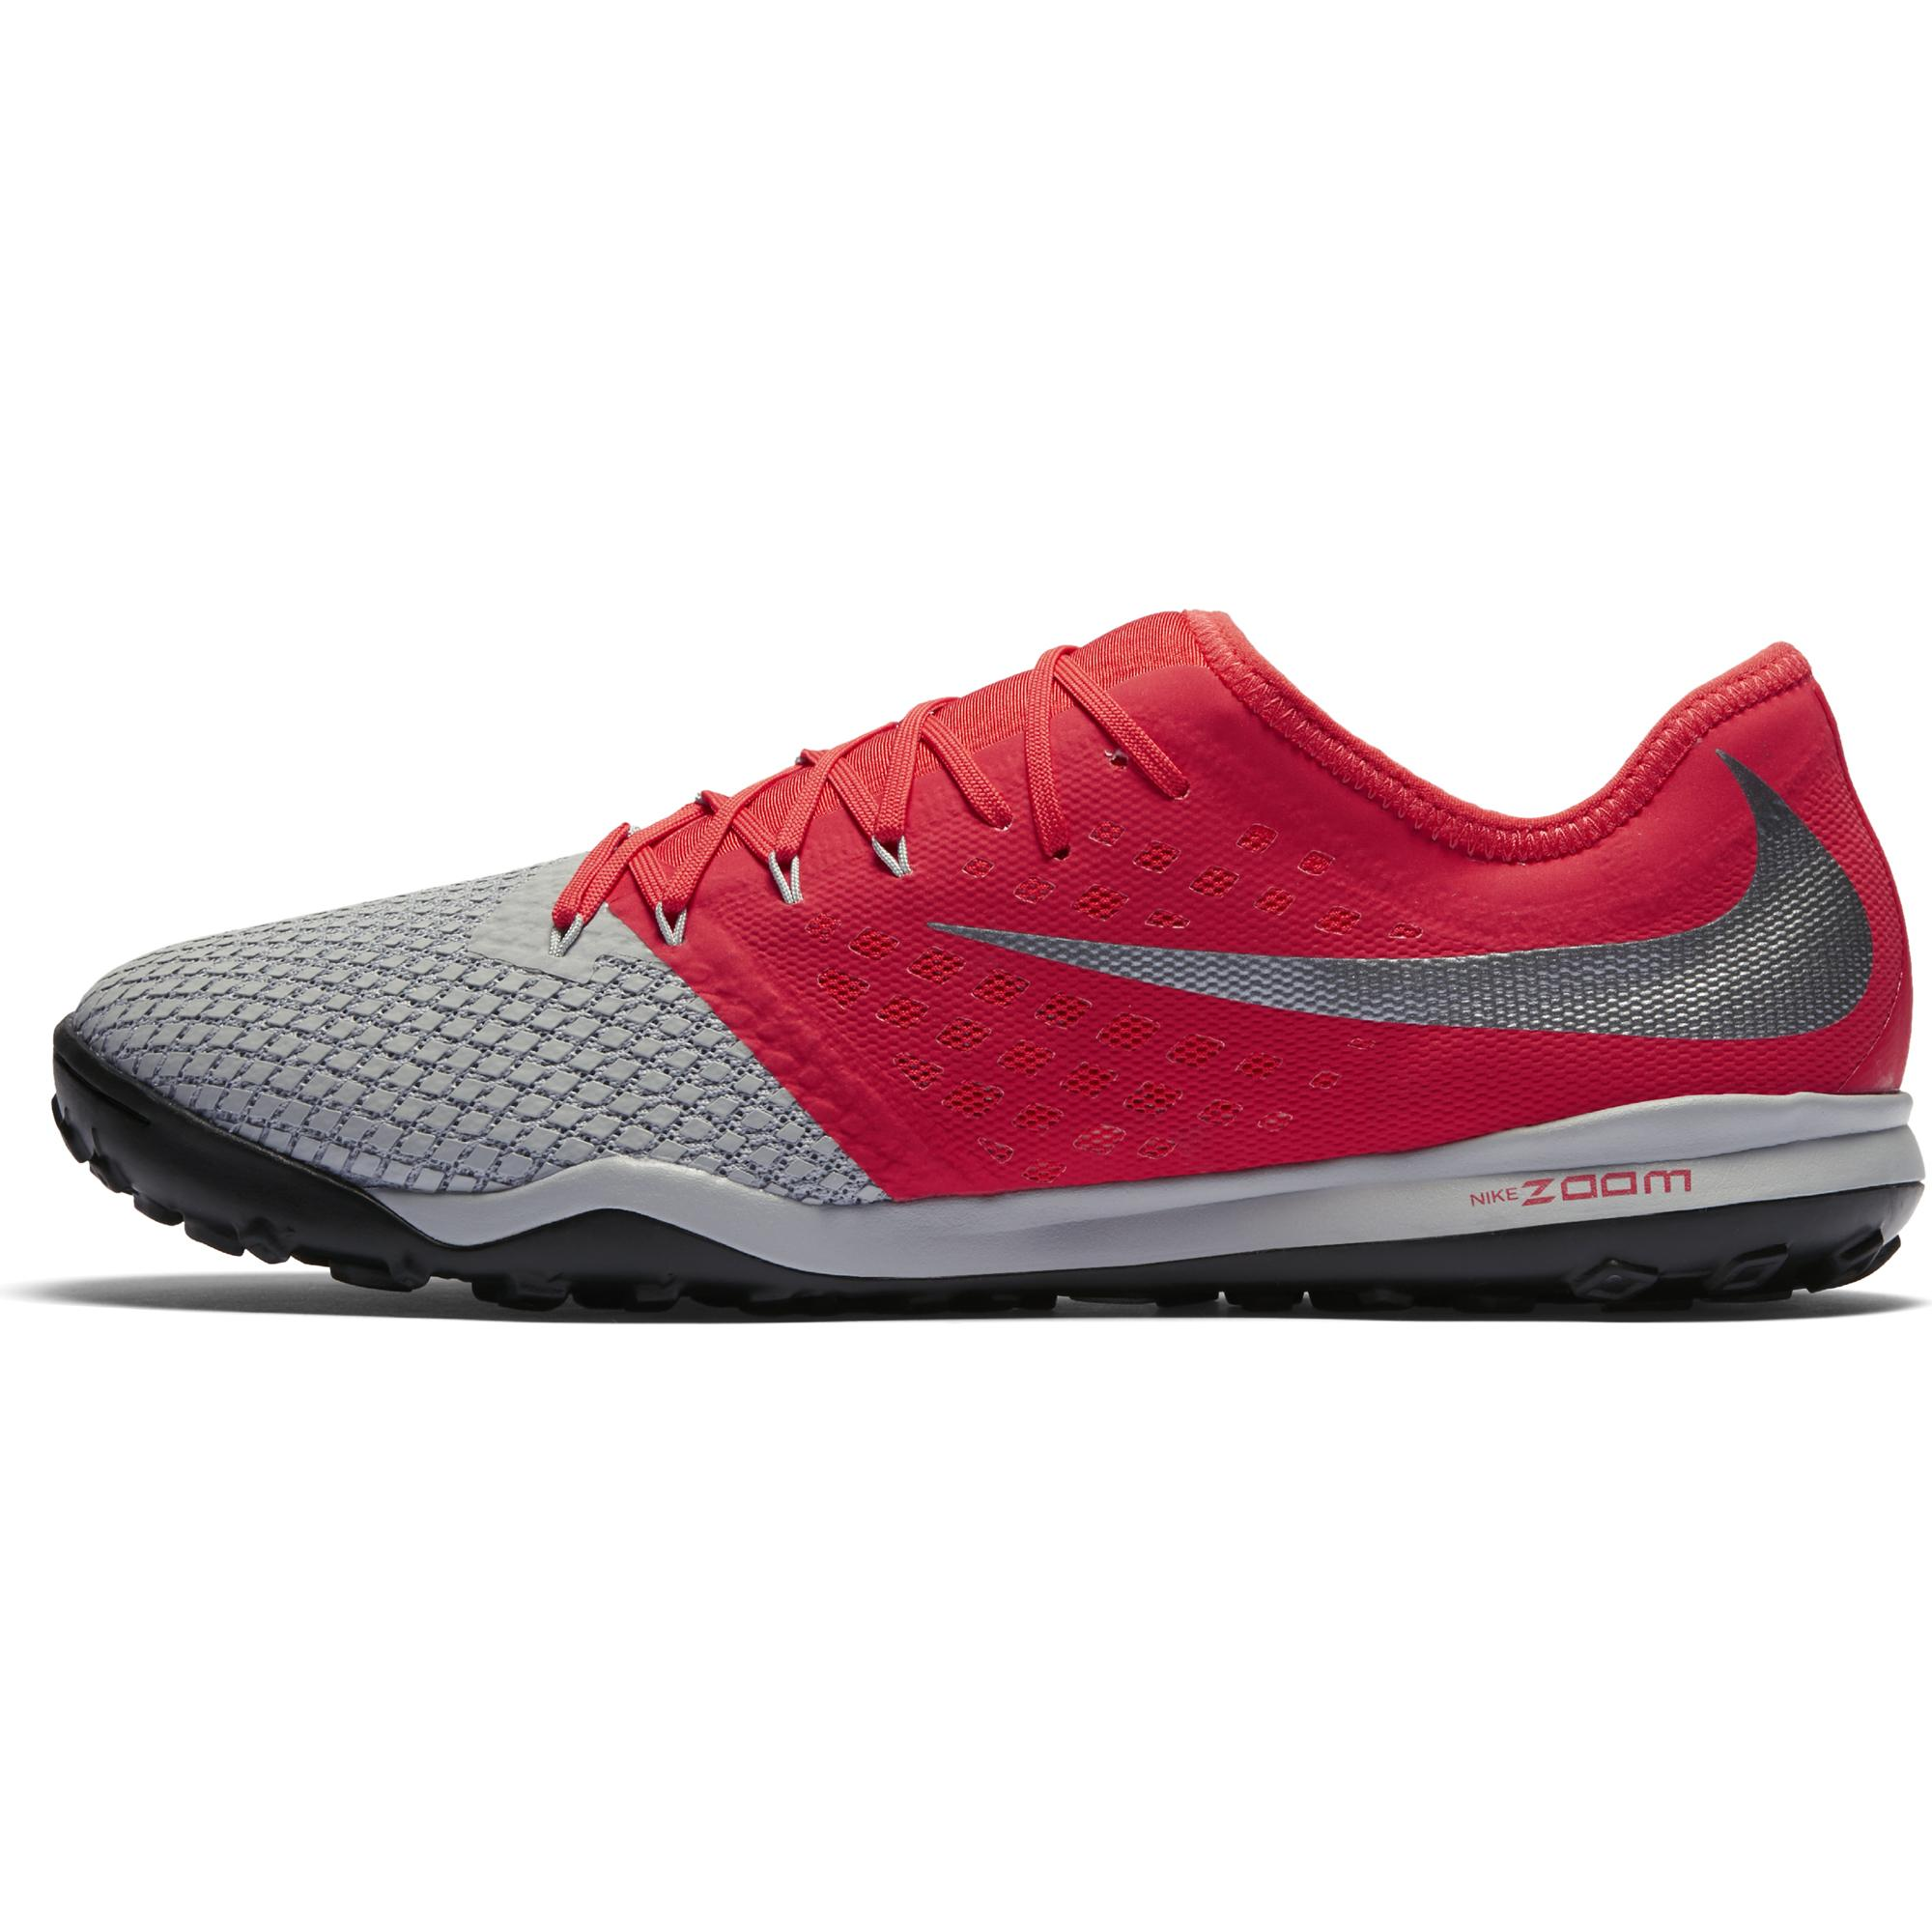 best cheap 0e790 f2982 Nike Futsal shoes ZOOM HYPERVENOM 3 PRO TF